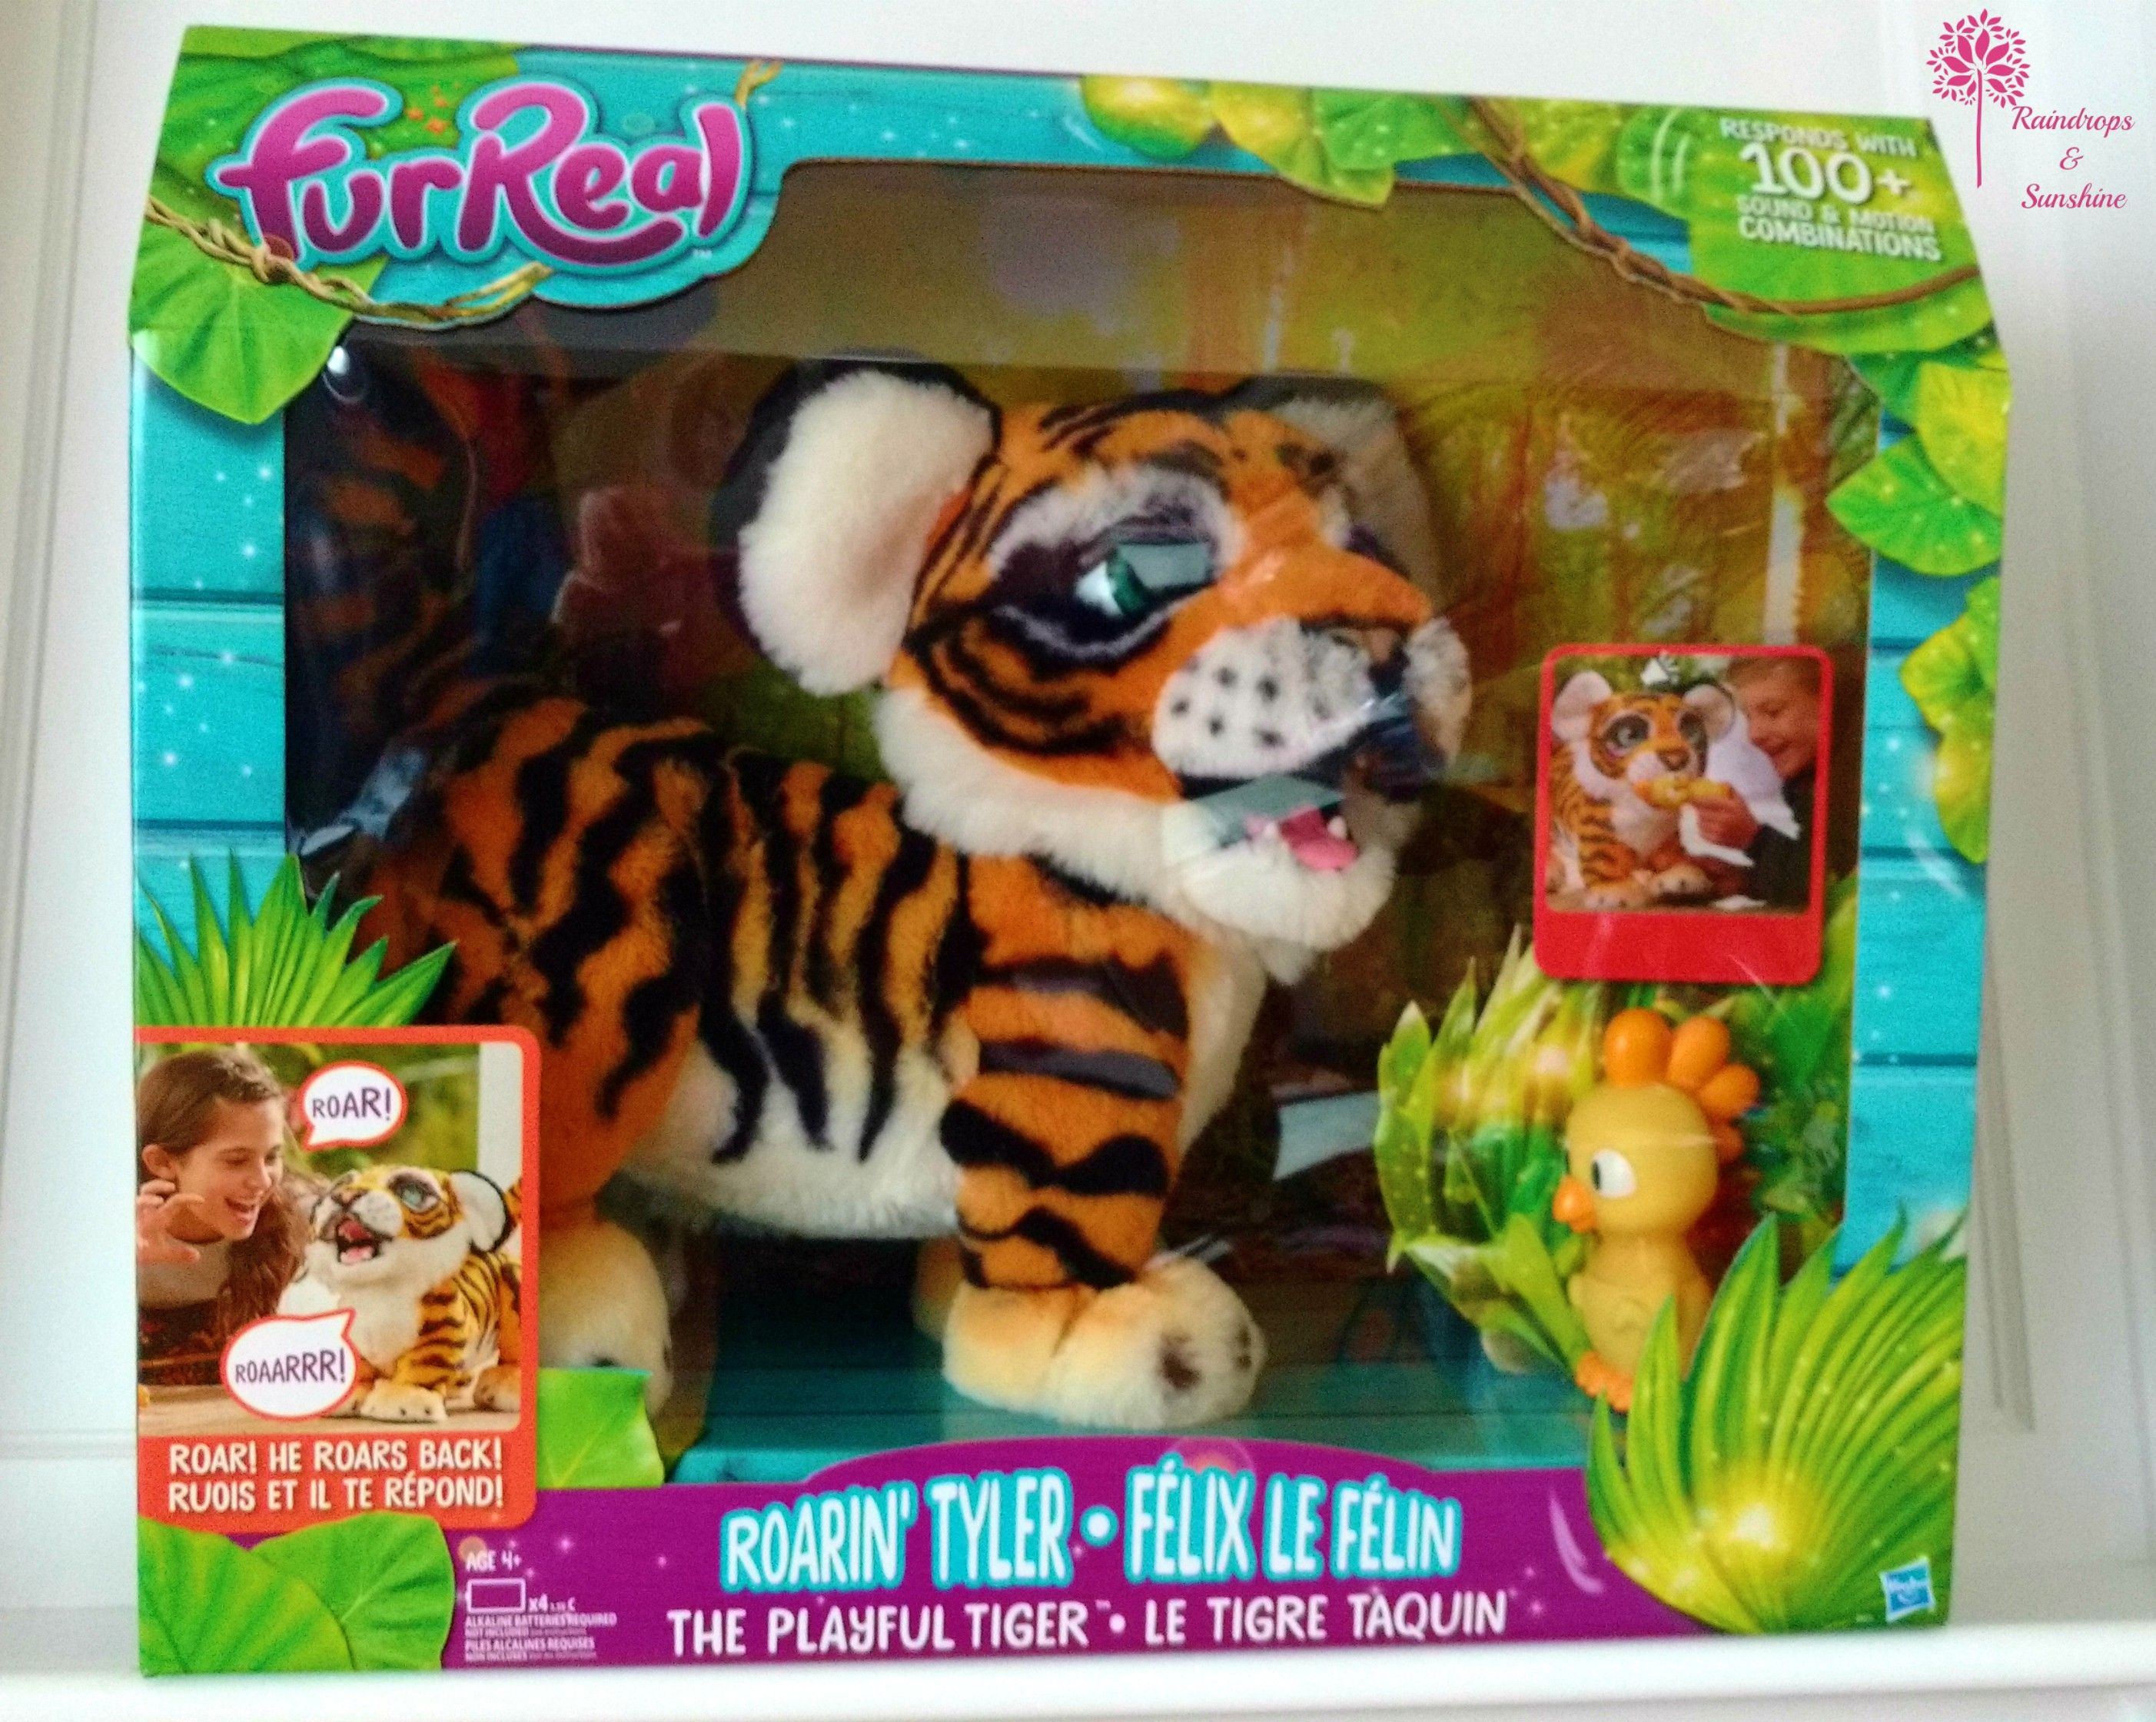 Furreal Friends Roarin Tyler The Playful Tiger Interactive Pet